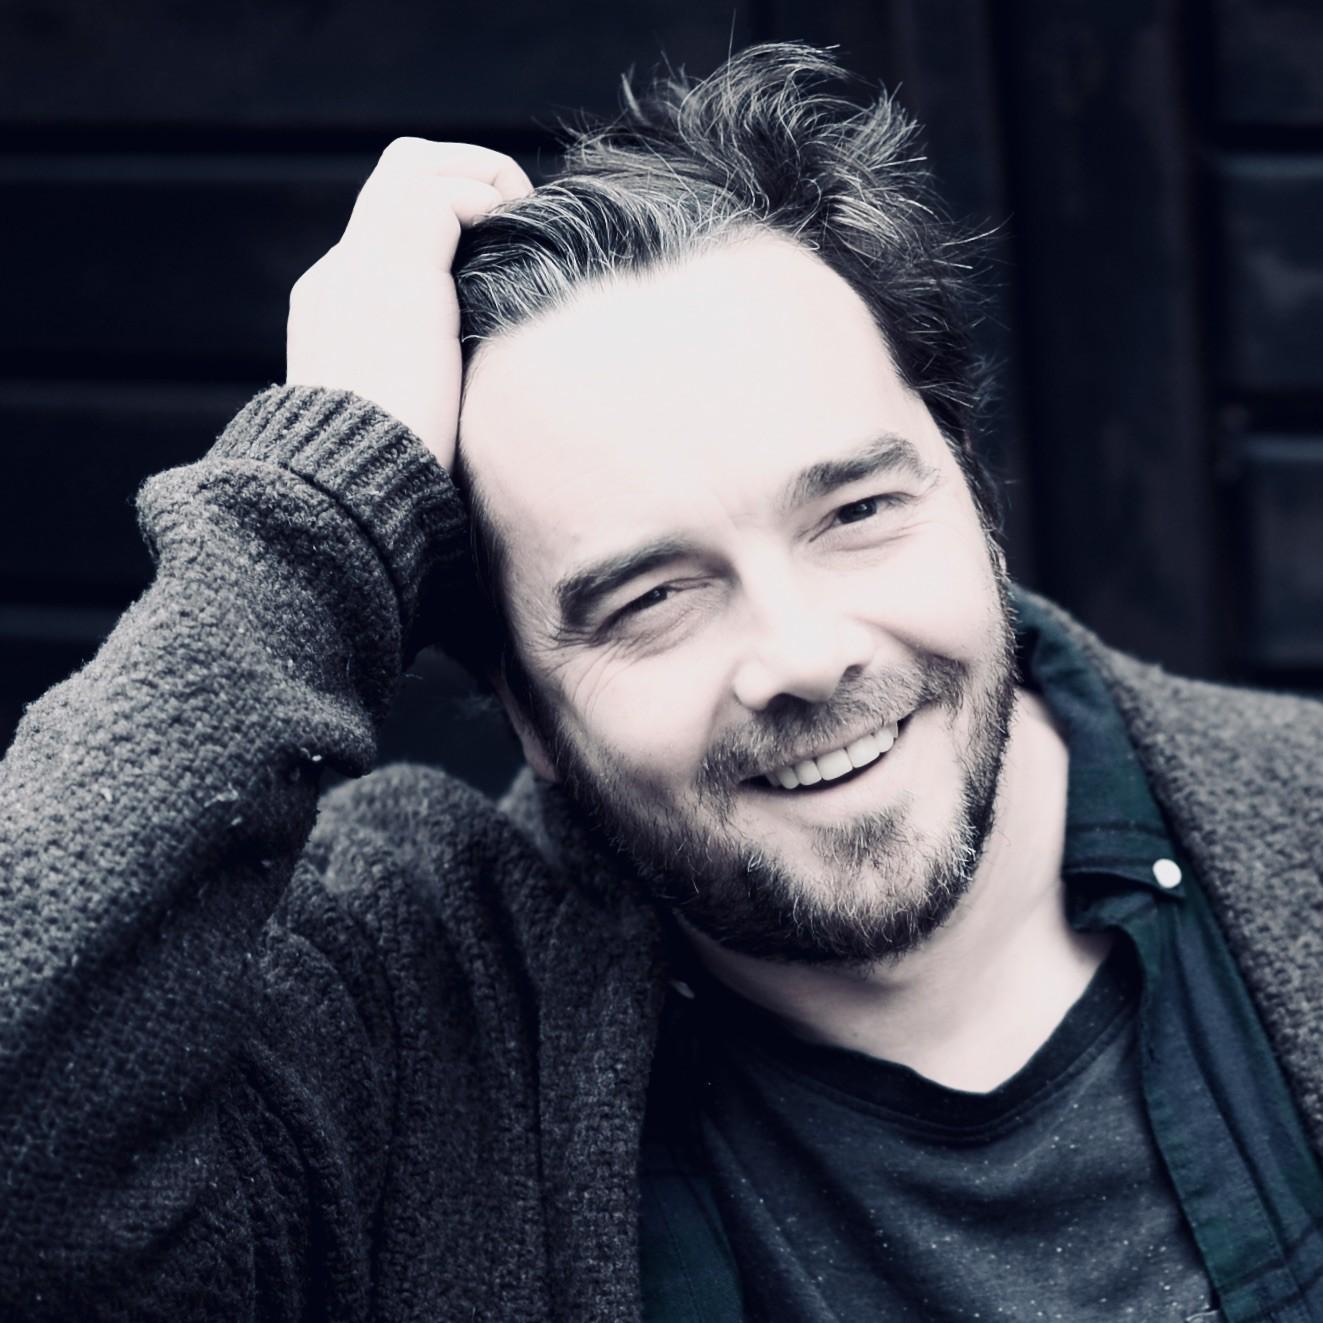 Nicolas Longeval